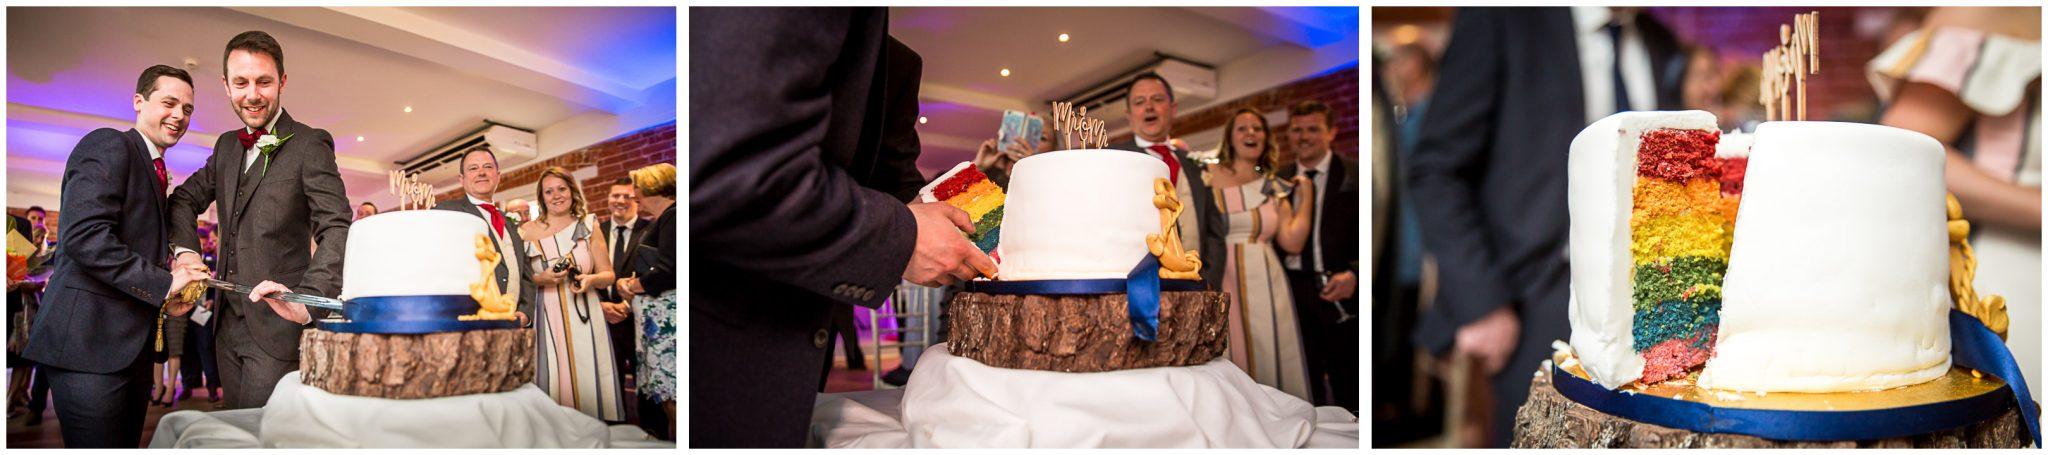 Sopley wedding photographer rainbow cake